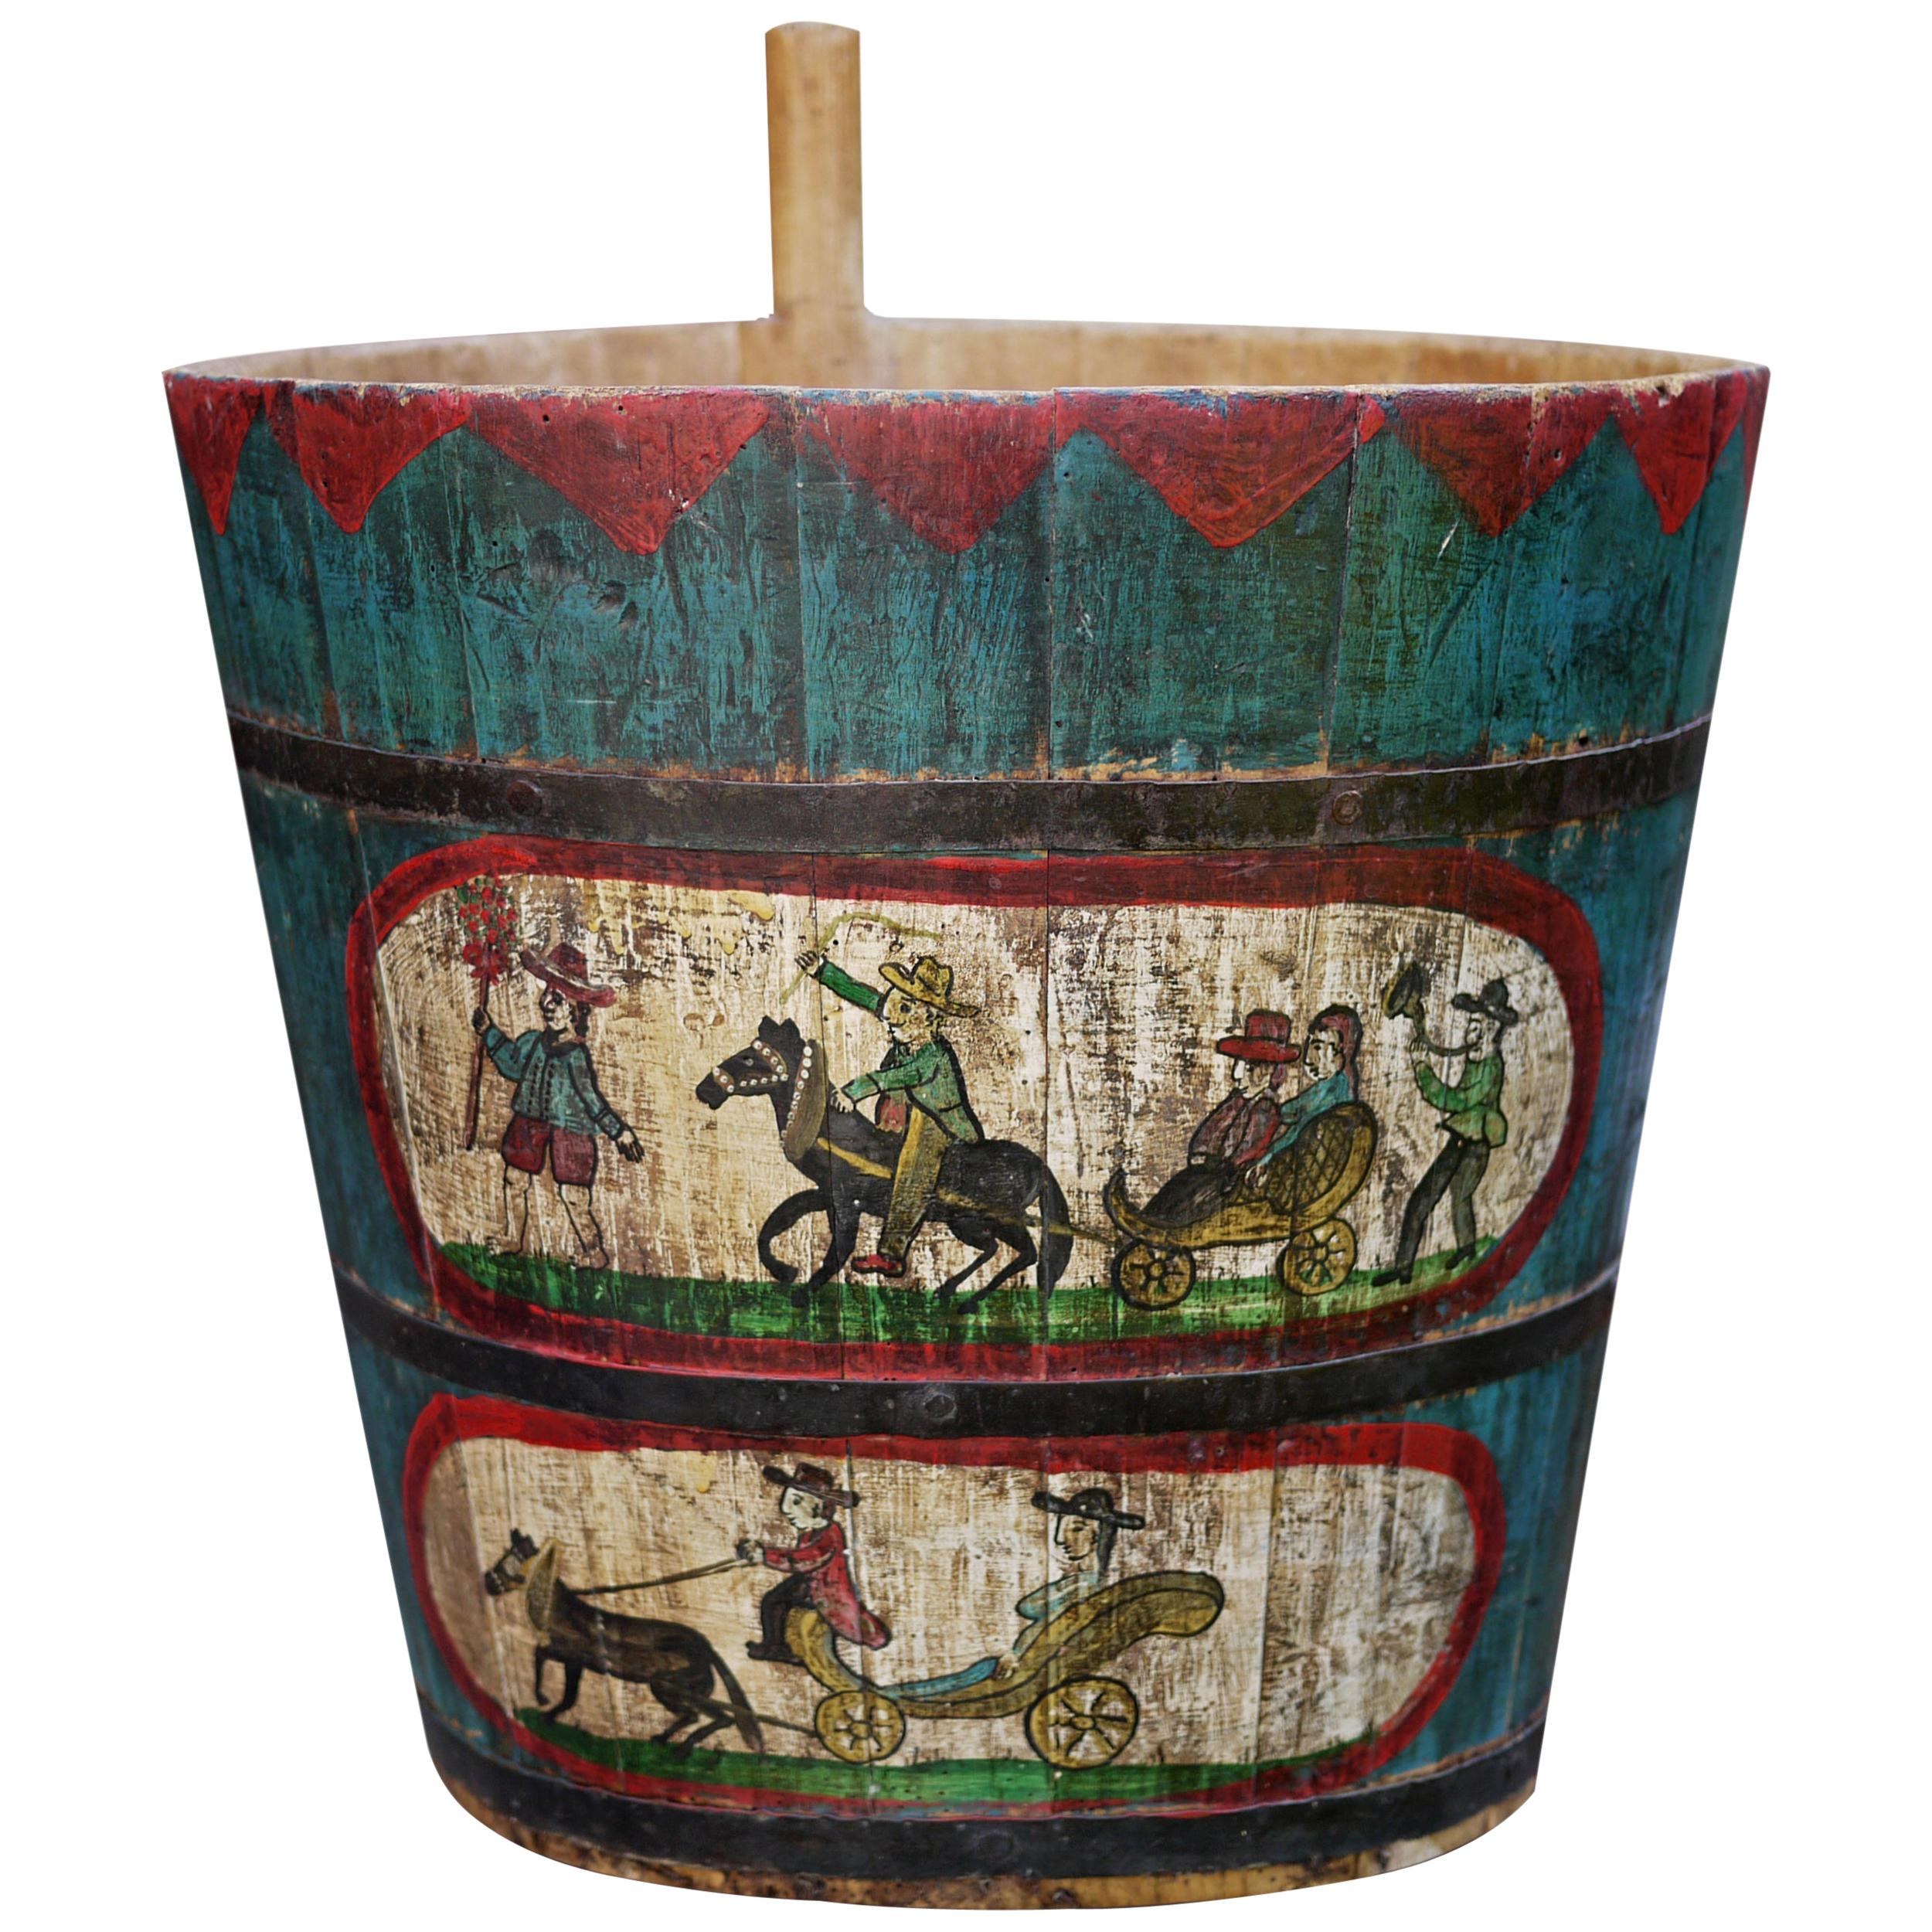 Original Old Painted Storage Basket, Hand Decorated